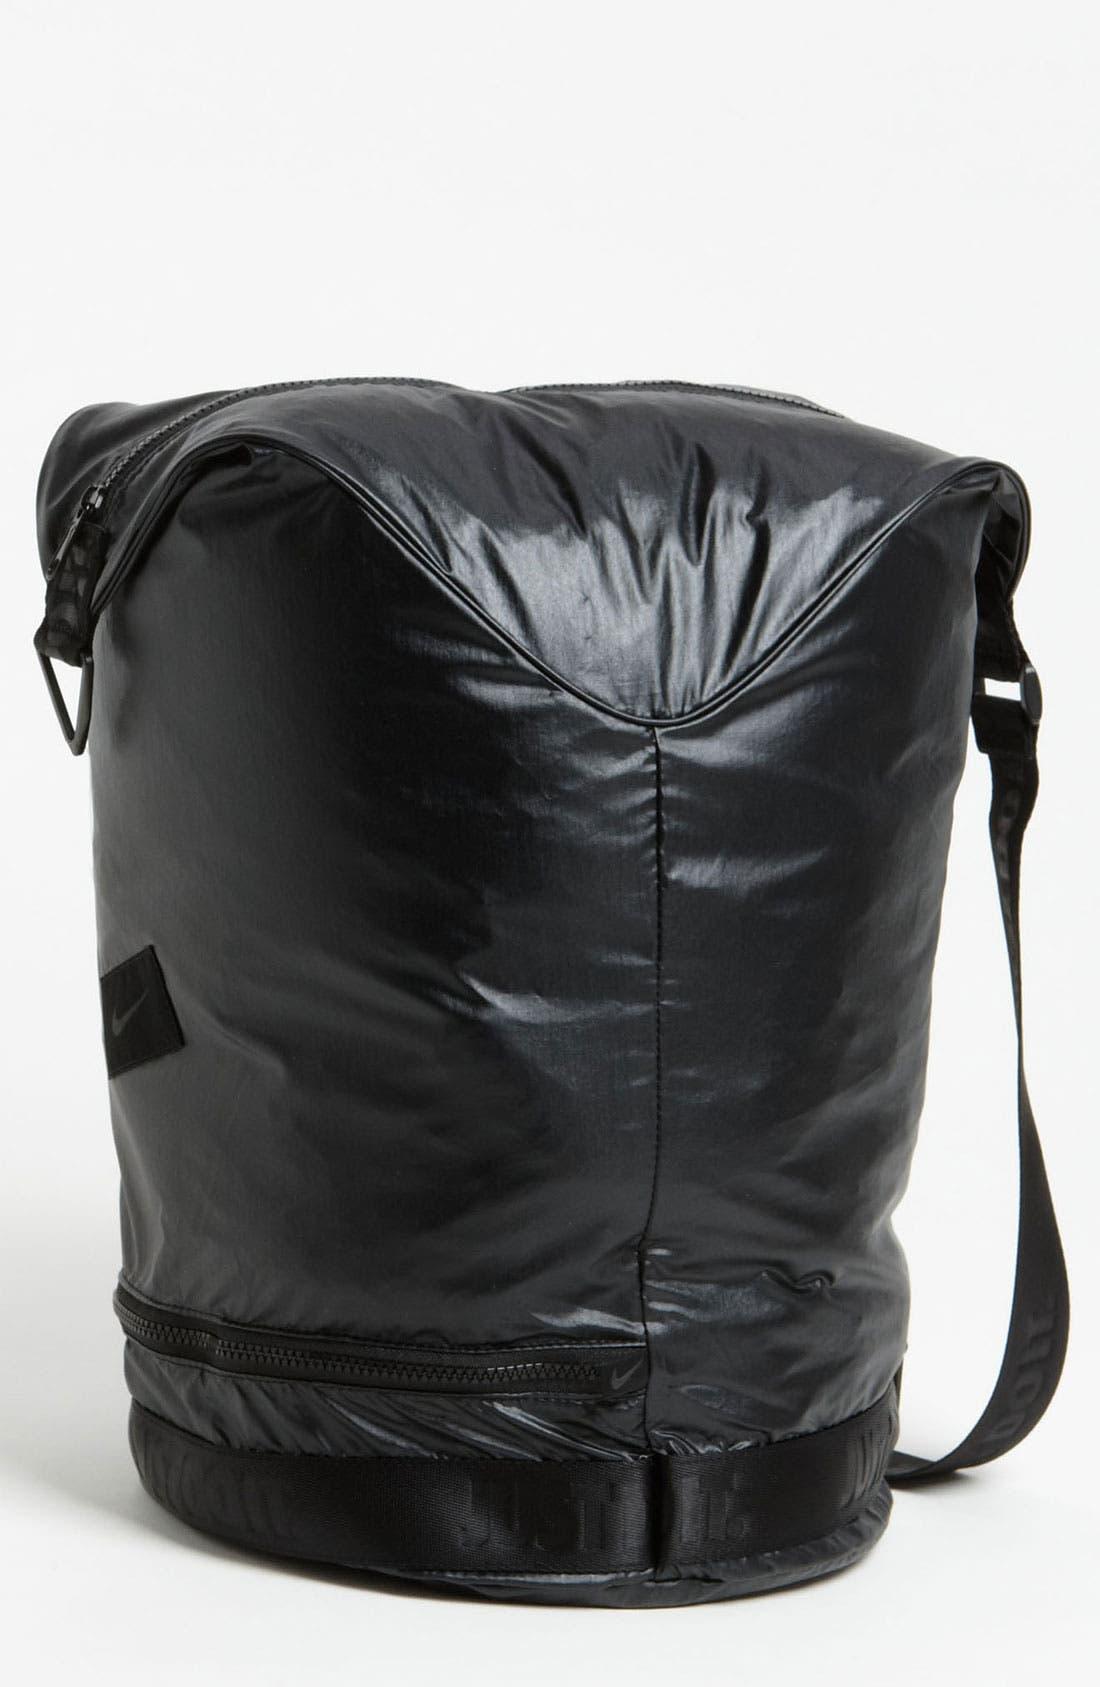 NIKE,                             'Bucket' Sling Bag,                             Alternate thumbnail 4, color,                             030